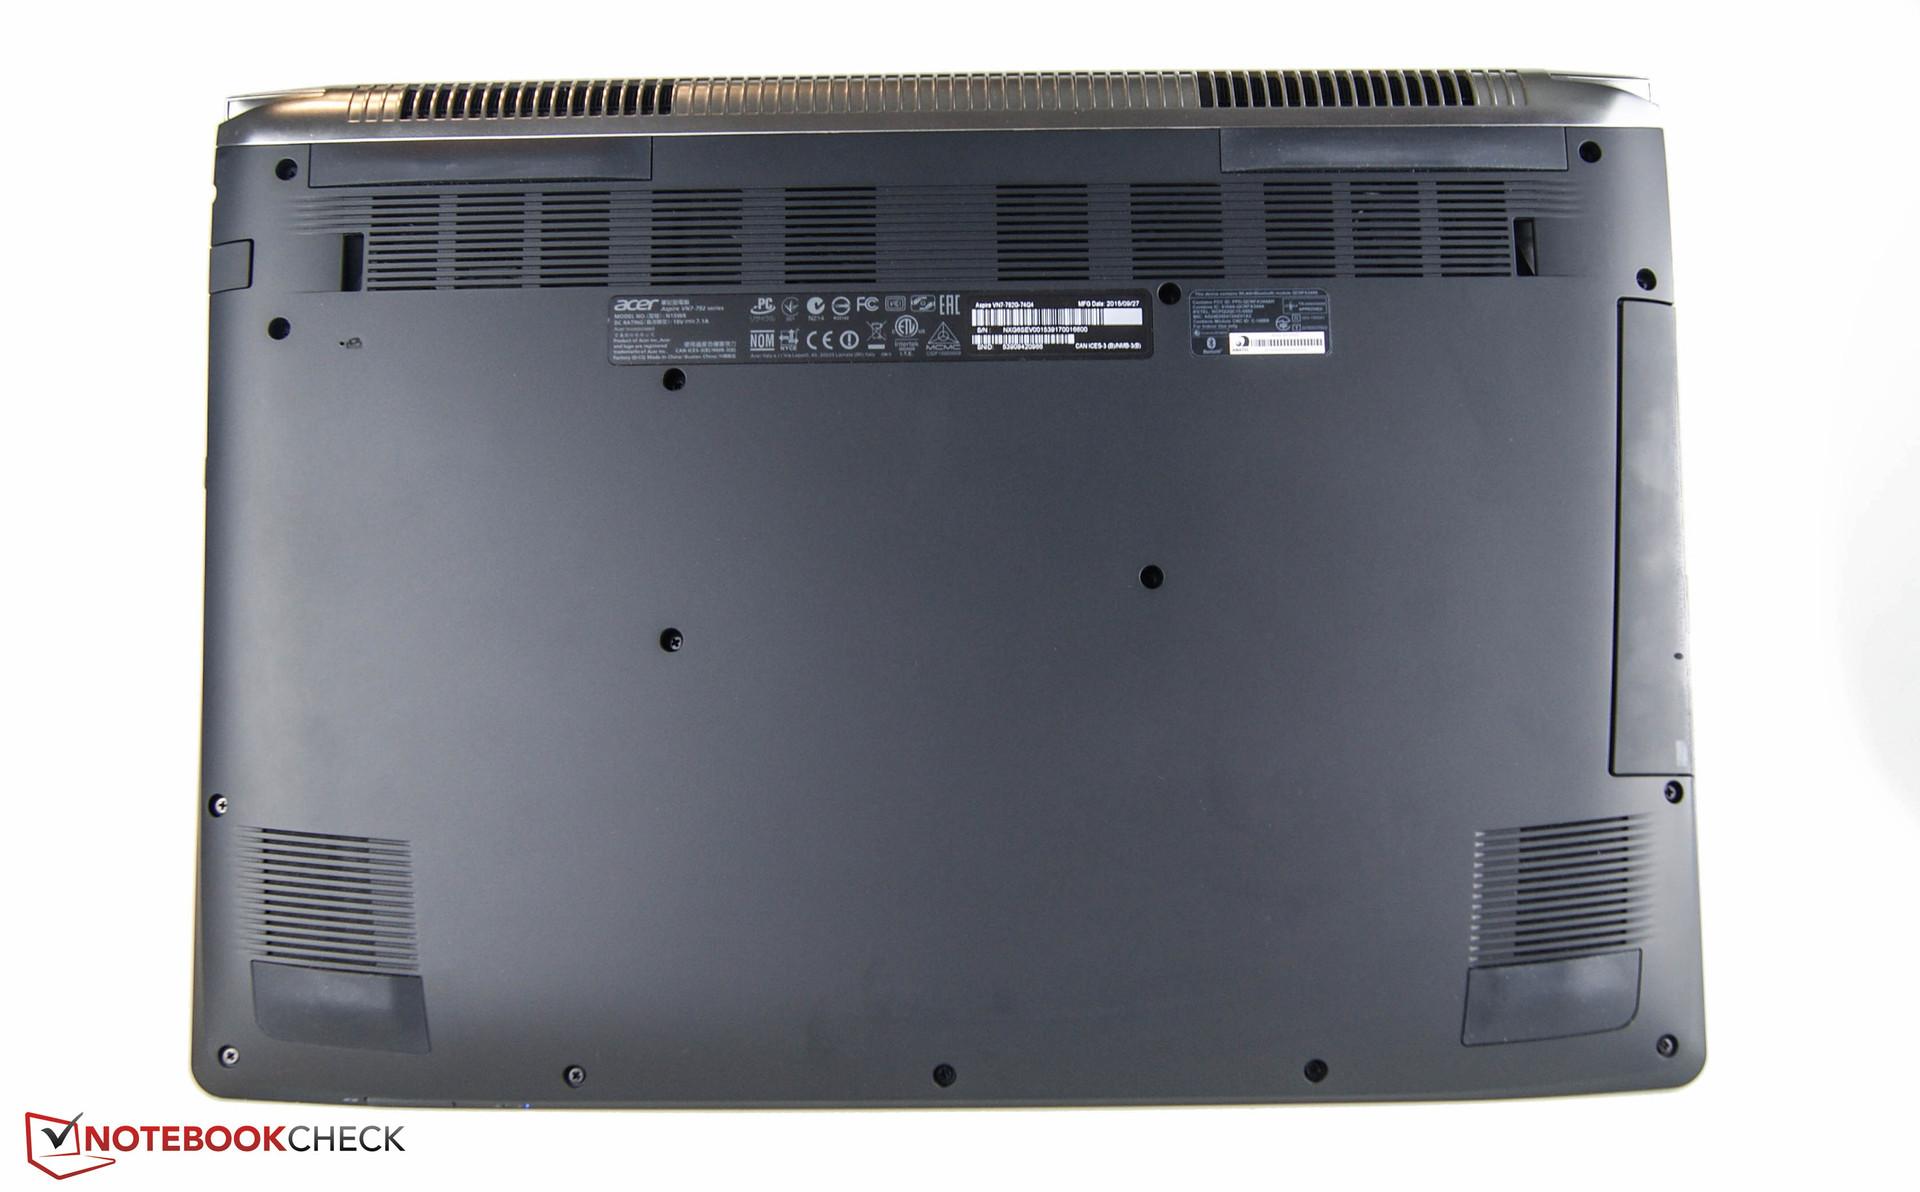 acer aspire v nitro black edition vn7-792g-74q4 notebook review